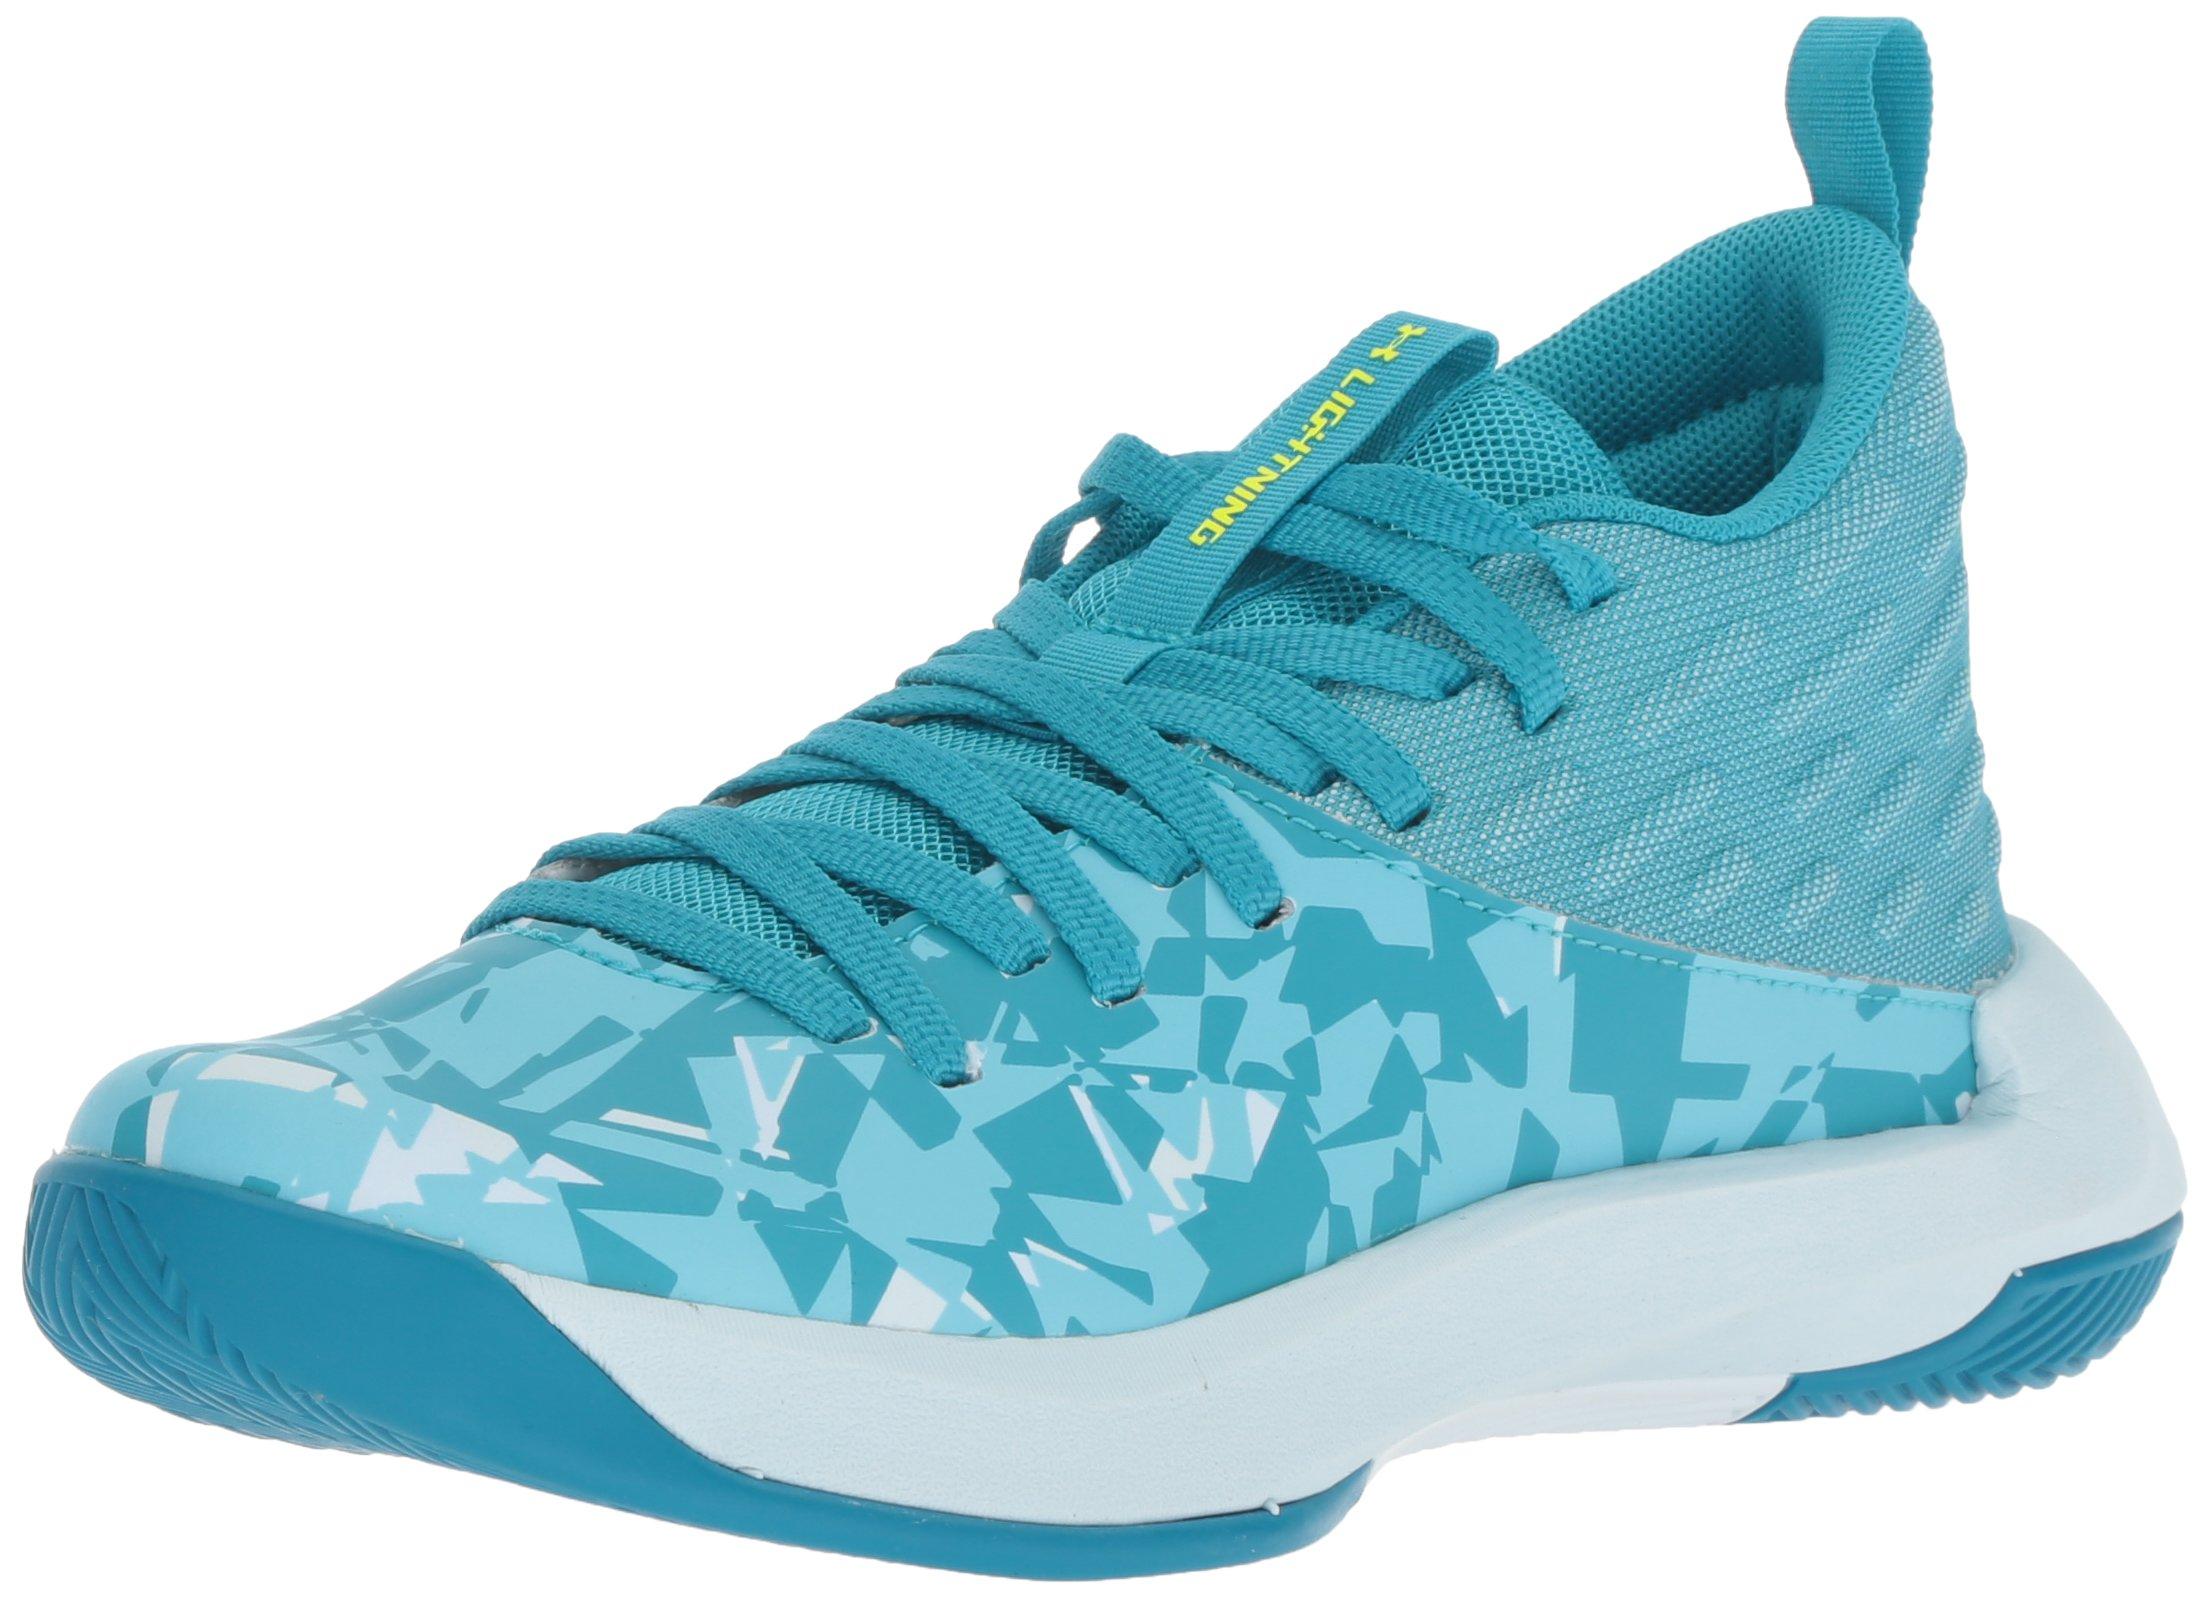 Under Armour Girls' Grade School Lightning 5 Basketball Shoe, Deceit (300)/Halogen Blue, 5.5 by Under Armour (Image #1)